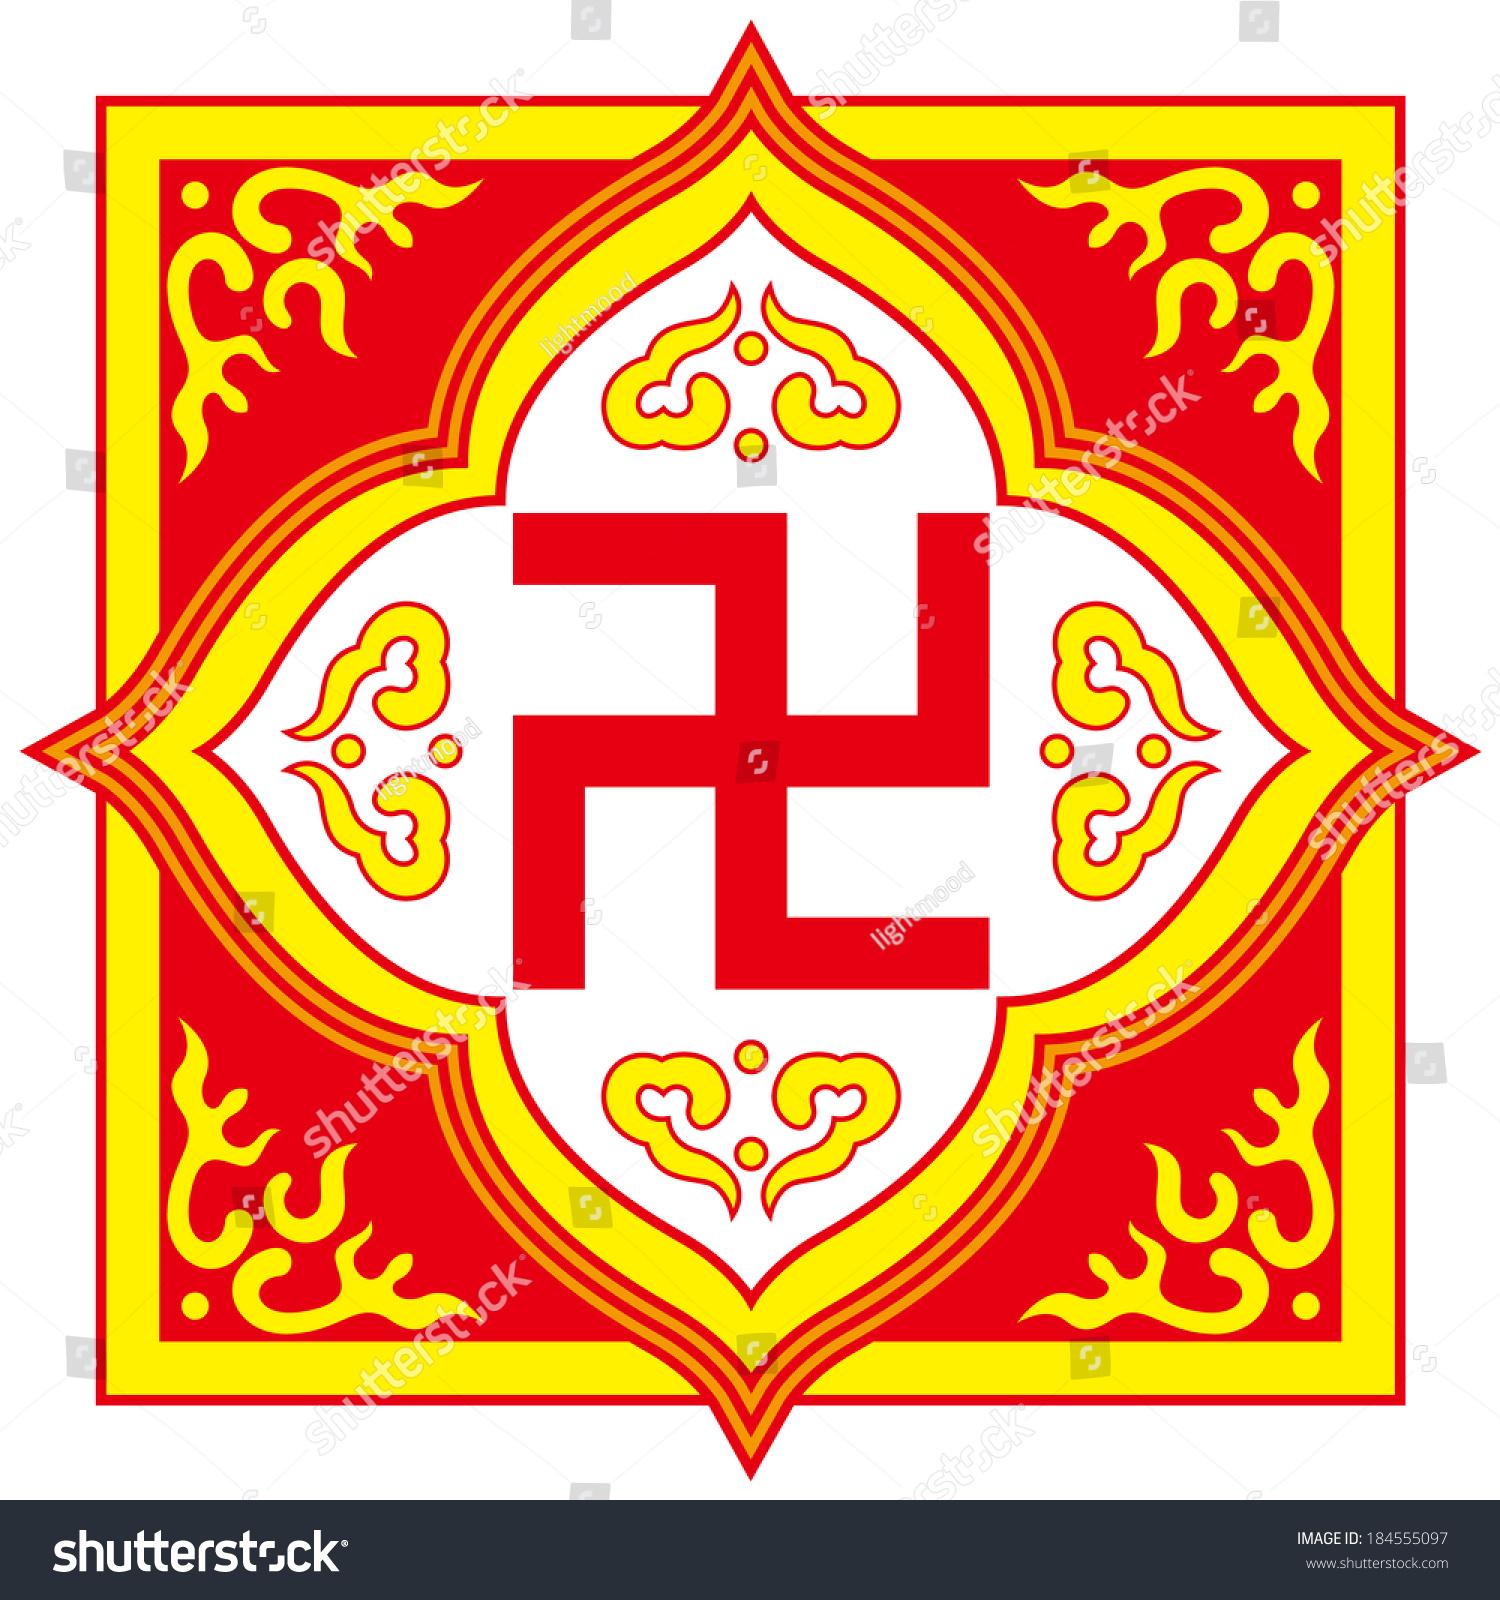 Swastika Symbol Buddhist Tradition Patternthe Symbol Could Stock